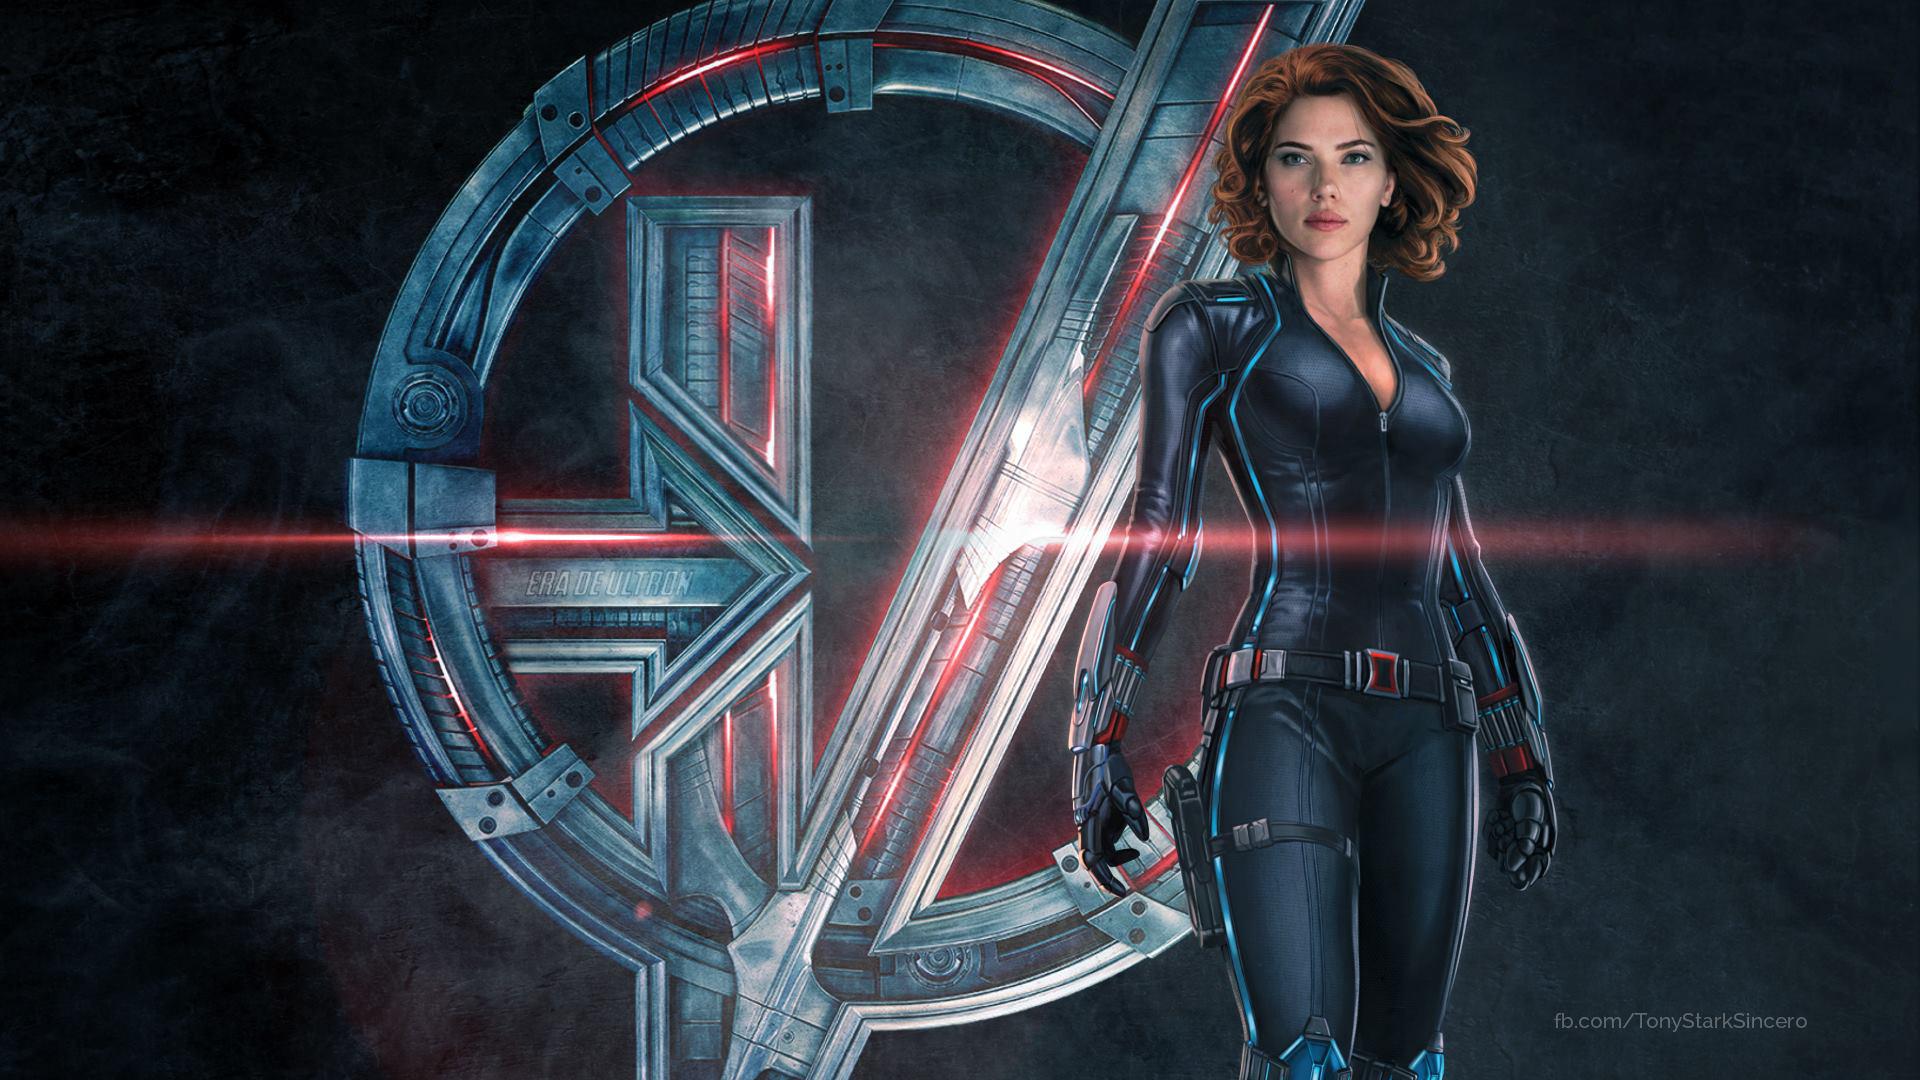 Wallpaper Movies Superhero Concept Art The Avengers Scarlett